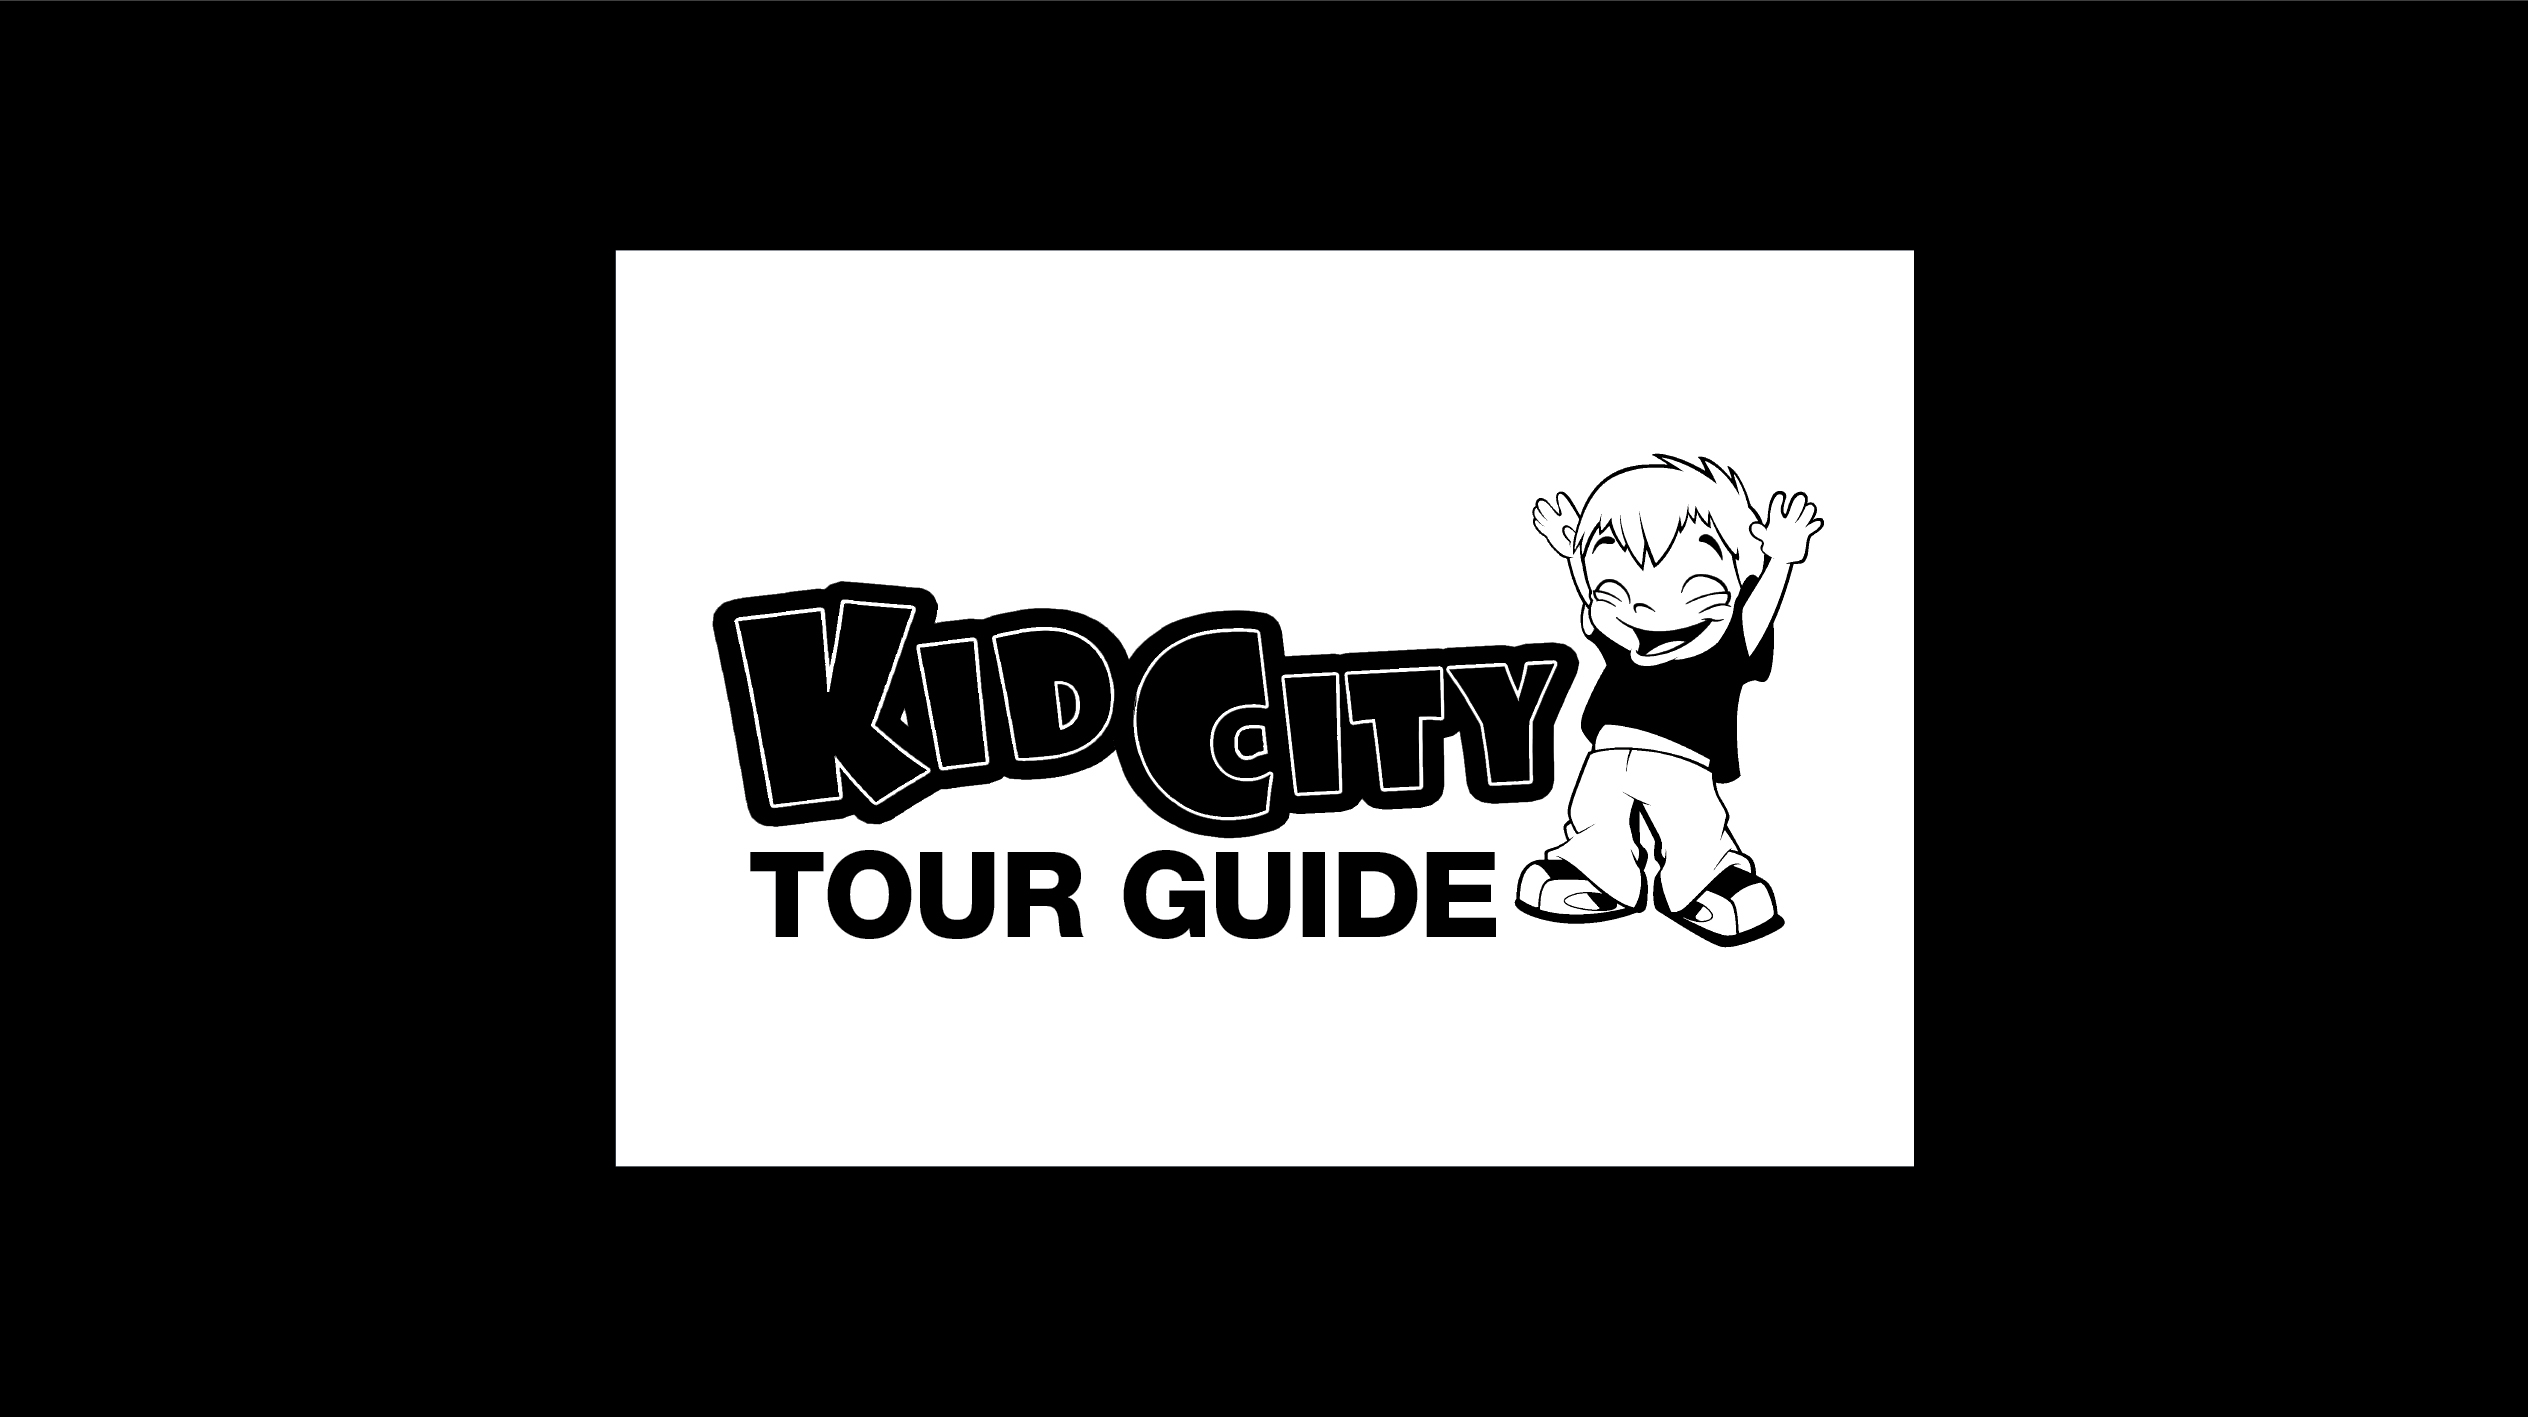 kid+city+logo.jpg